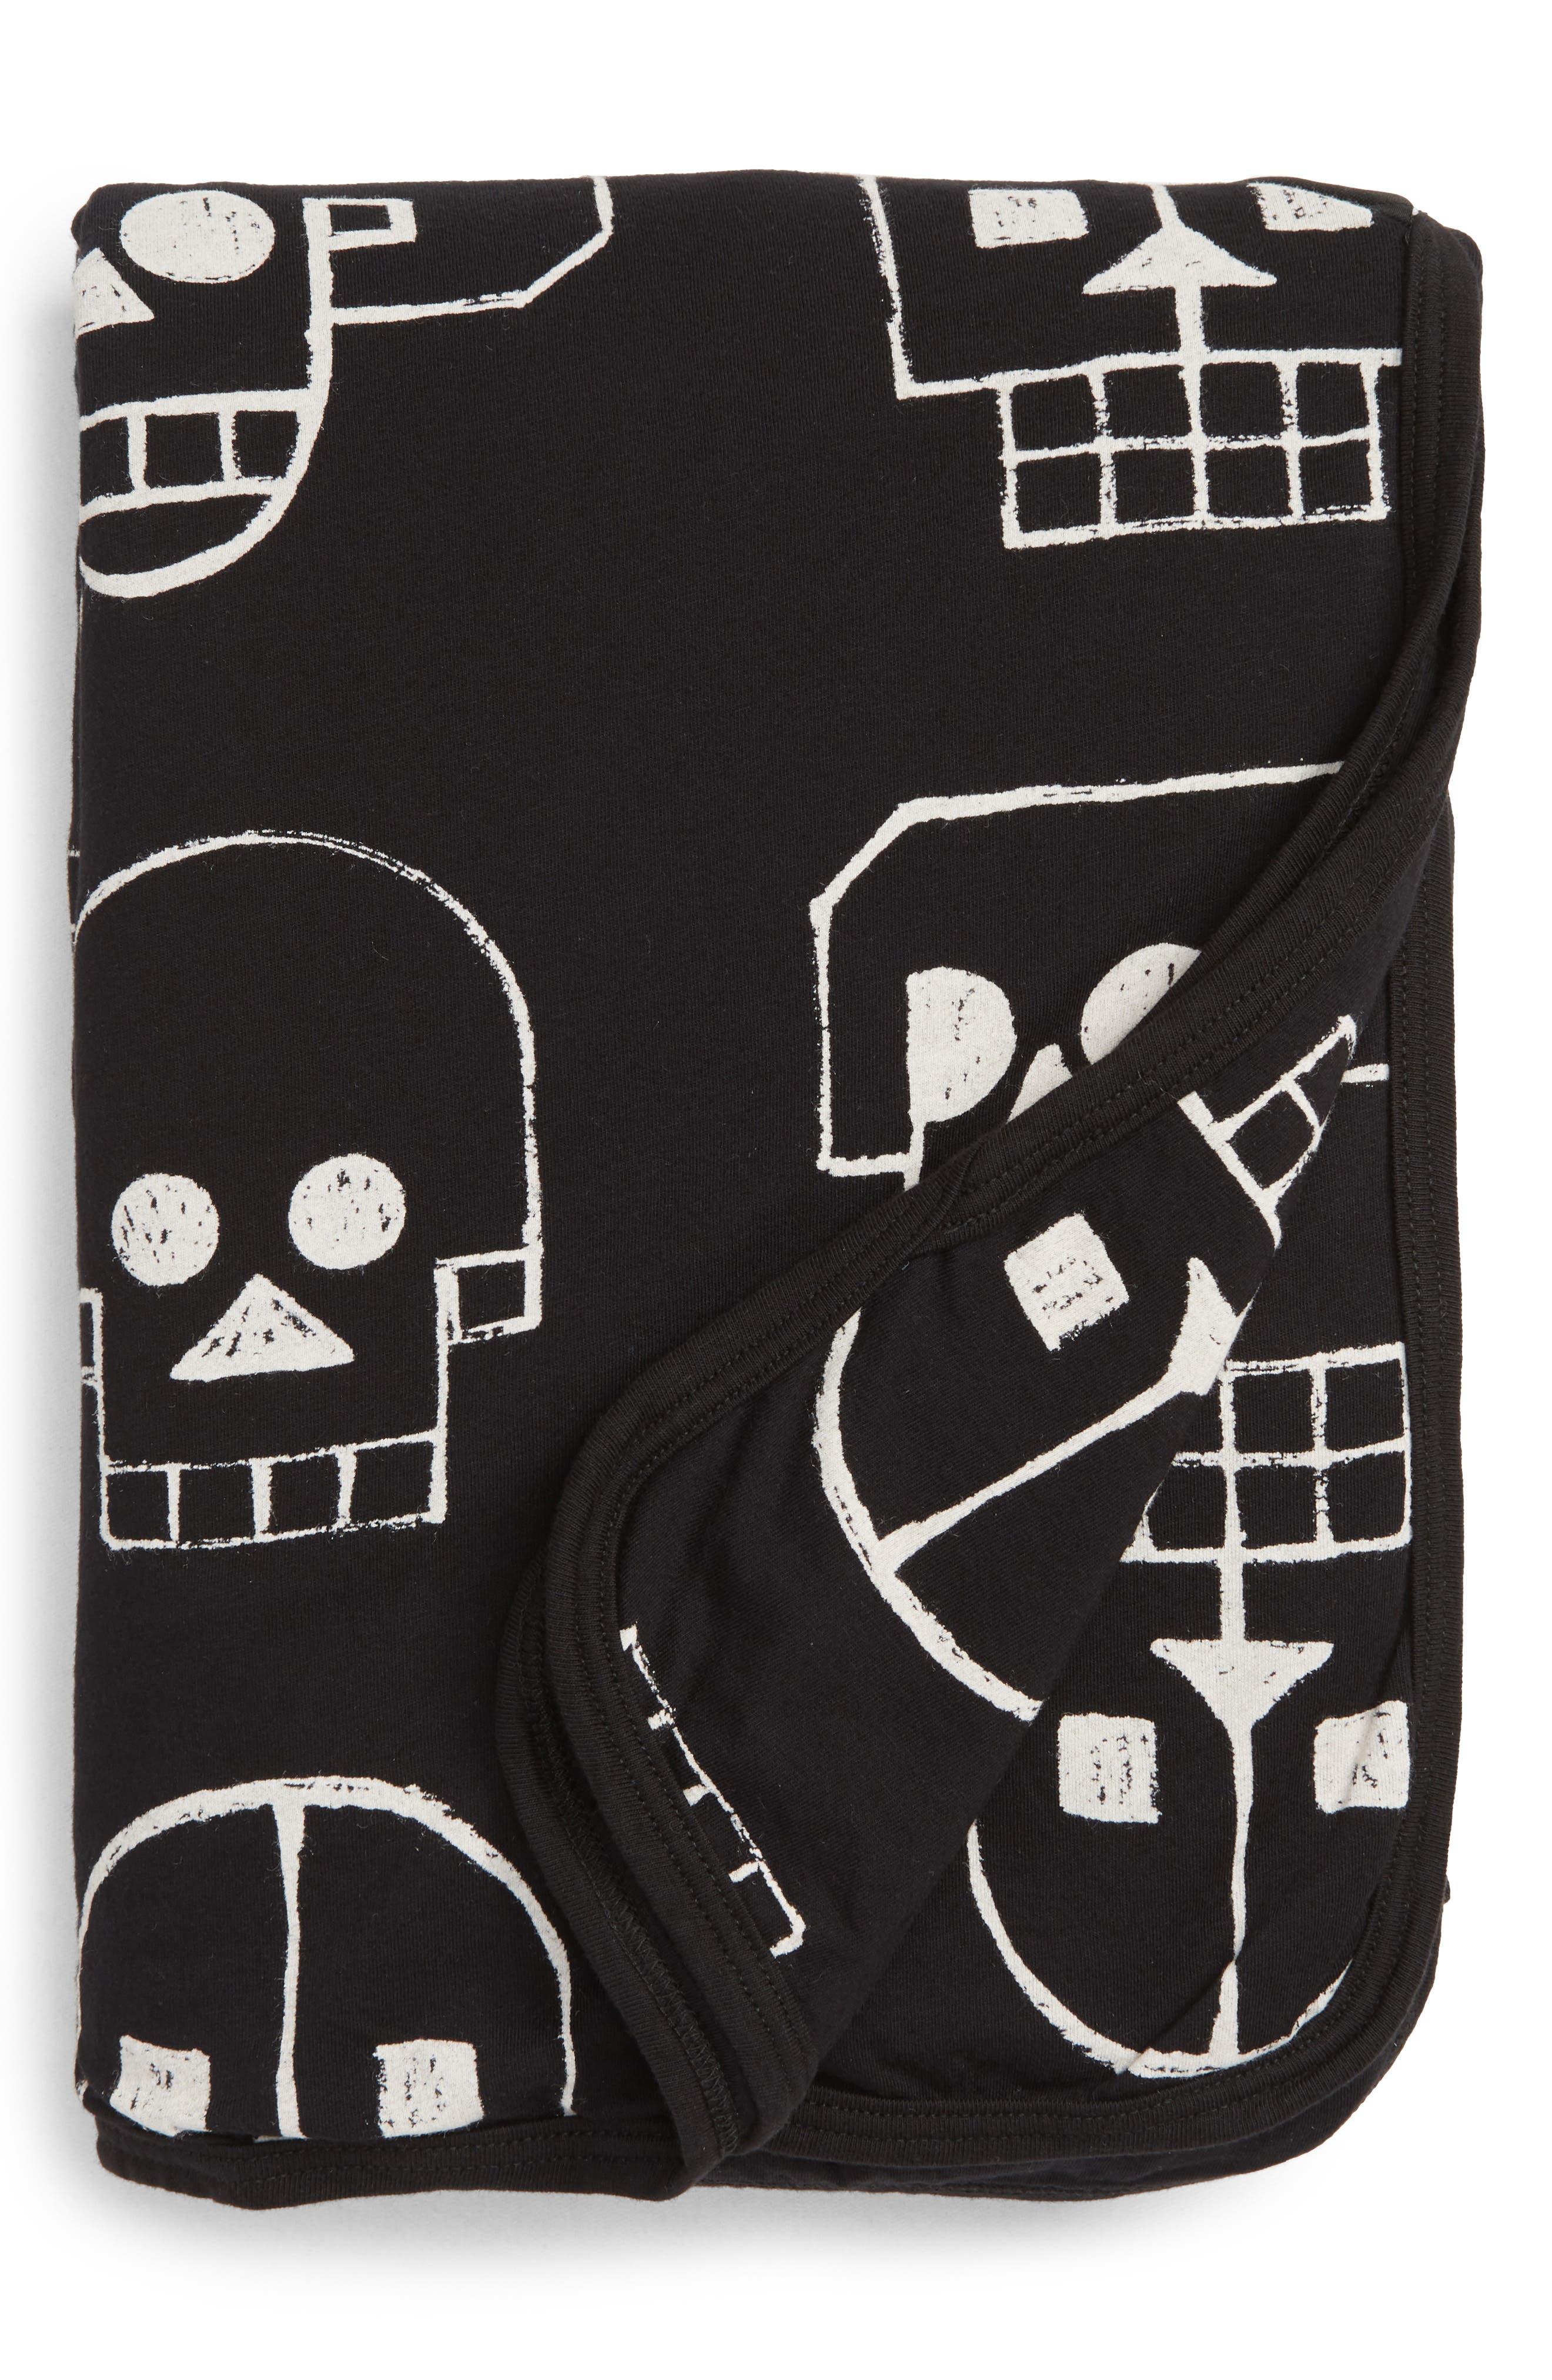 Skull Robot Print Blanket,                         Main,                         color, 001